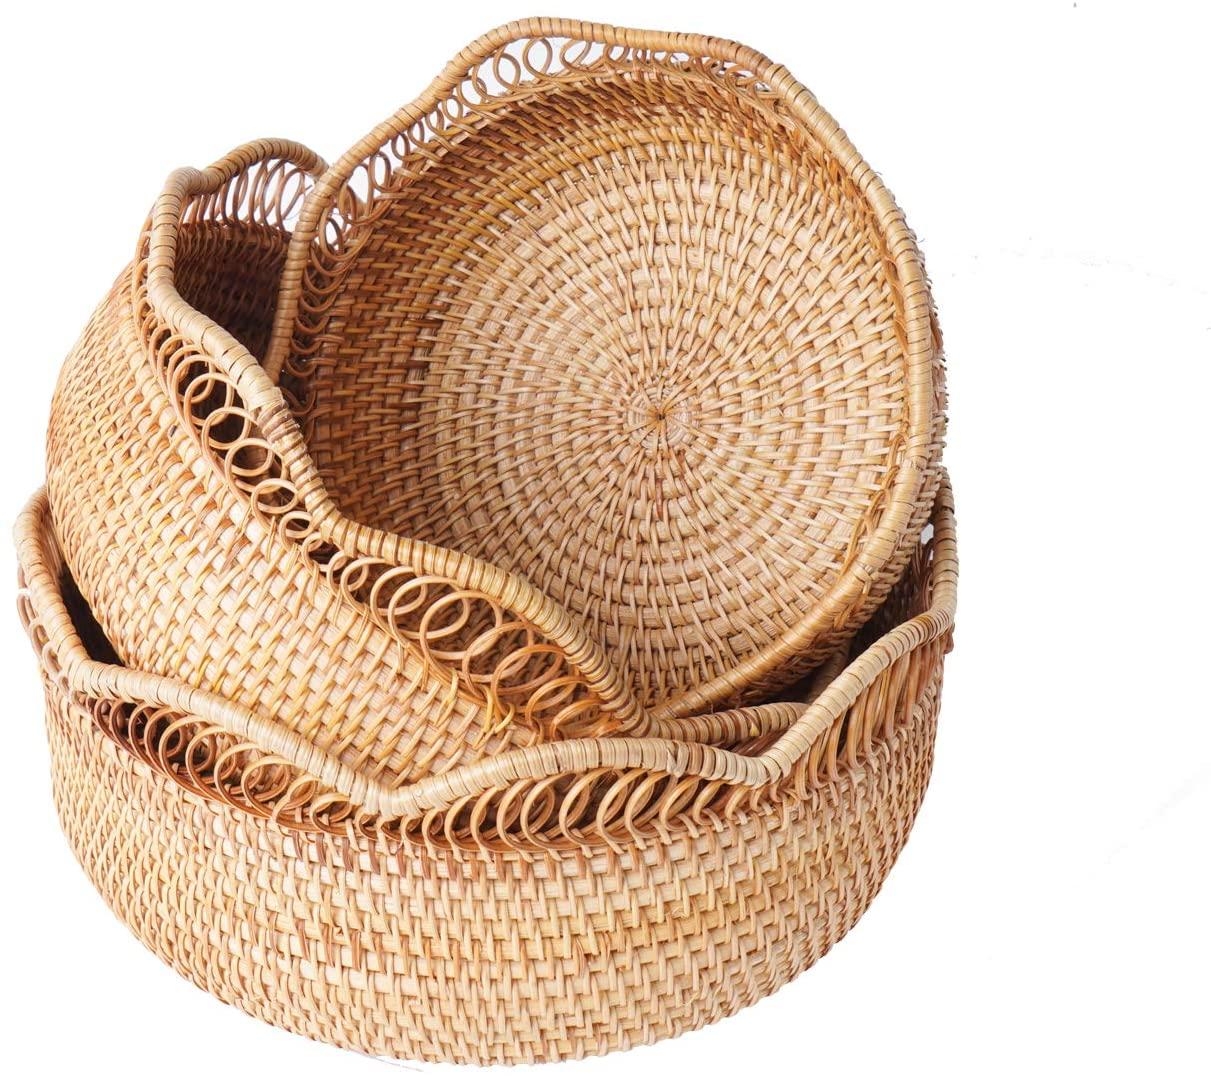 Natural Bamboo Round Rattan Wicker Baskets for Storage, Fruit Basket, Bread Baskets for Serving, Kitchen - Snack Gift Basket (S2)